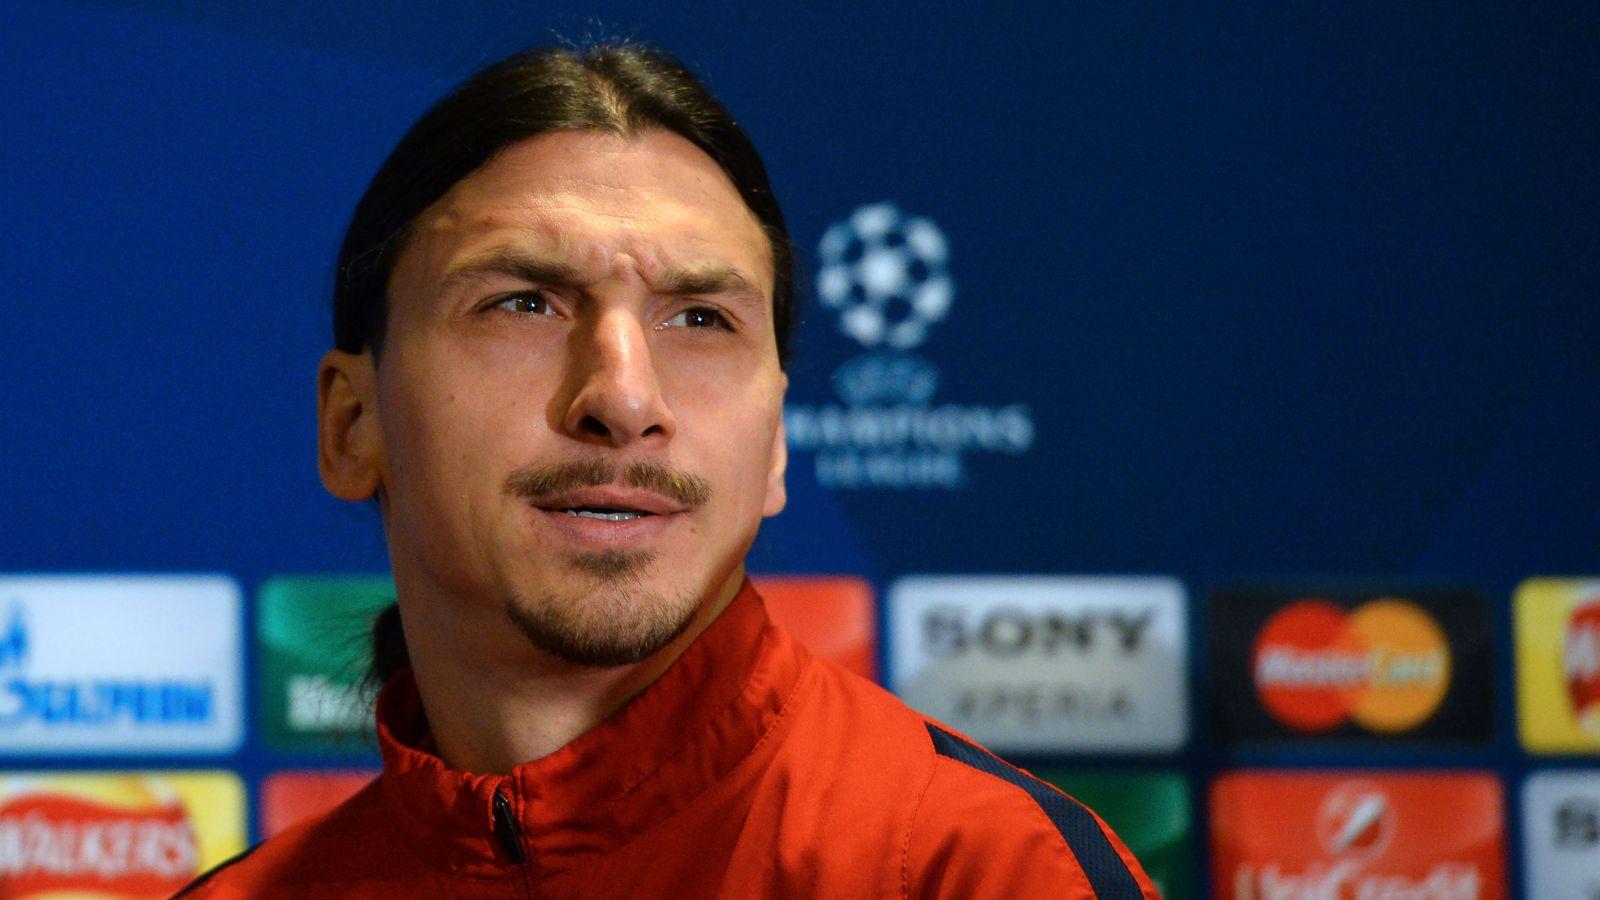 PSG striker Ibrahimovic preparing for United move